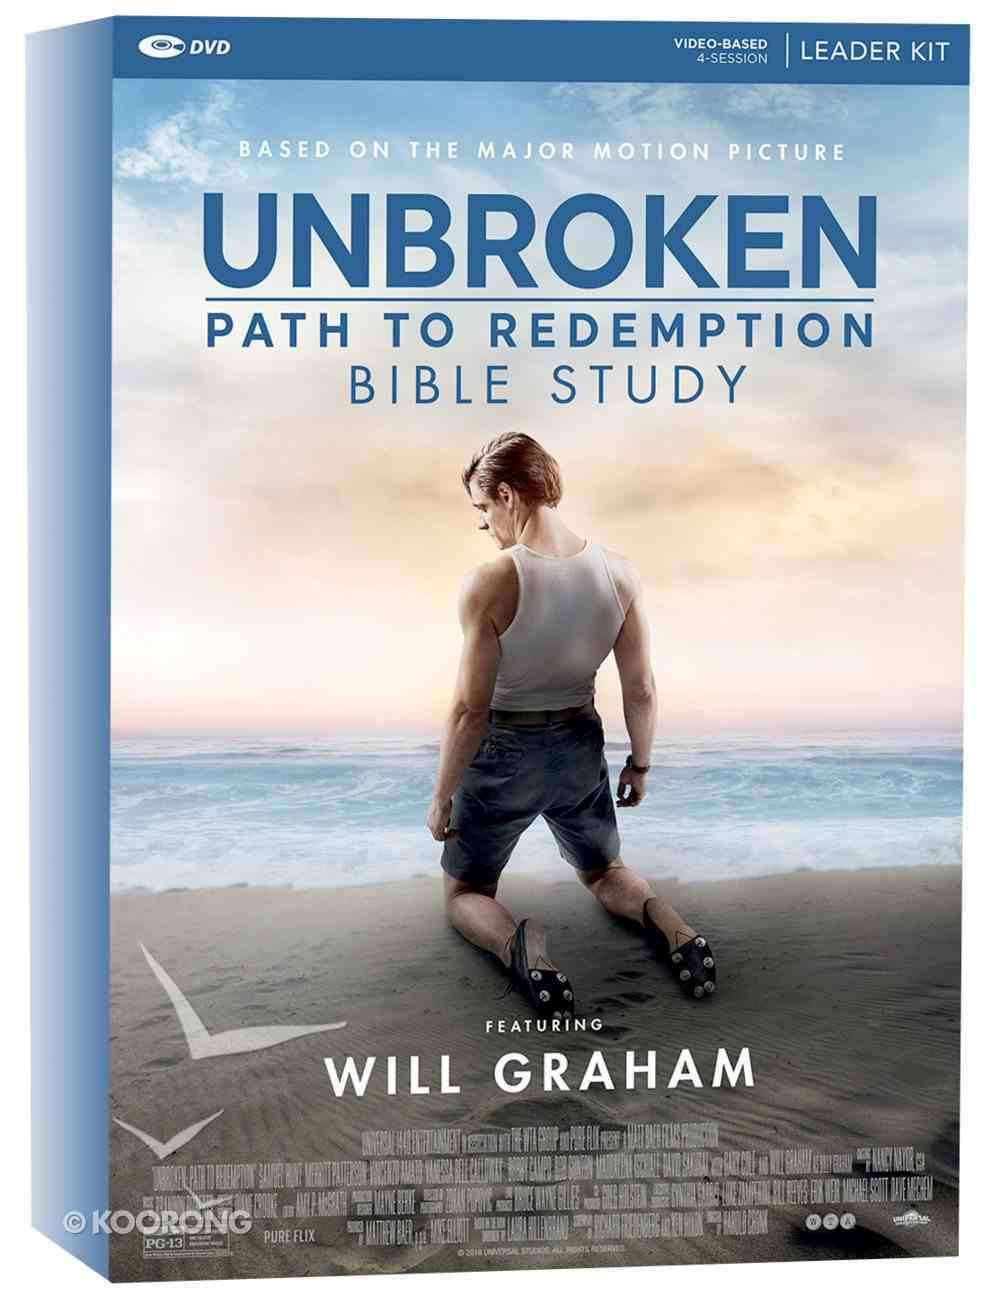 Unbroken: Path to Redemption (Leader Kit) Pack